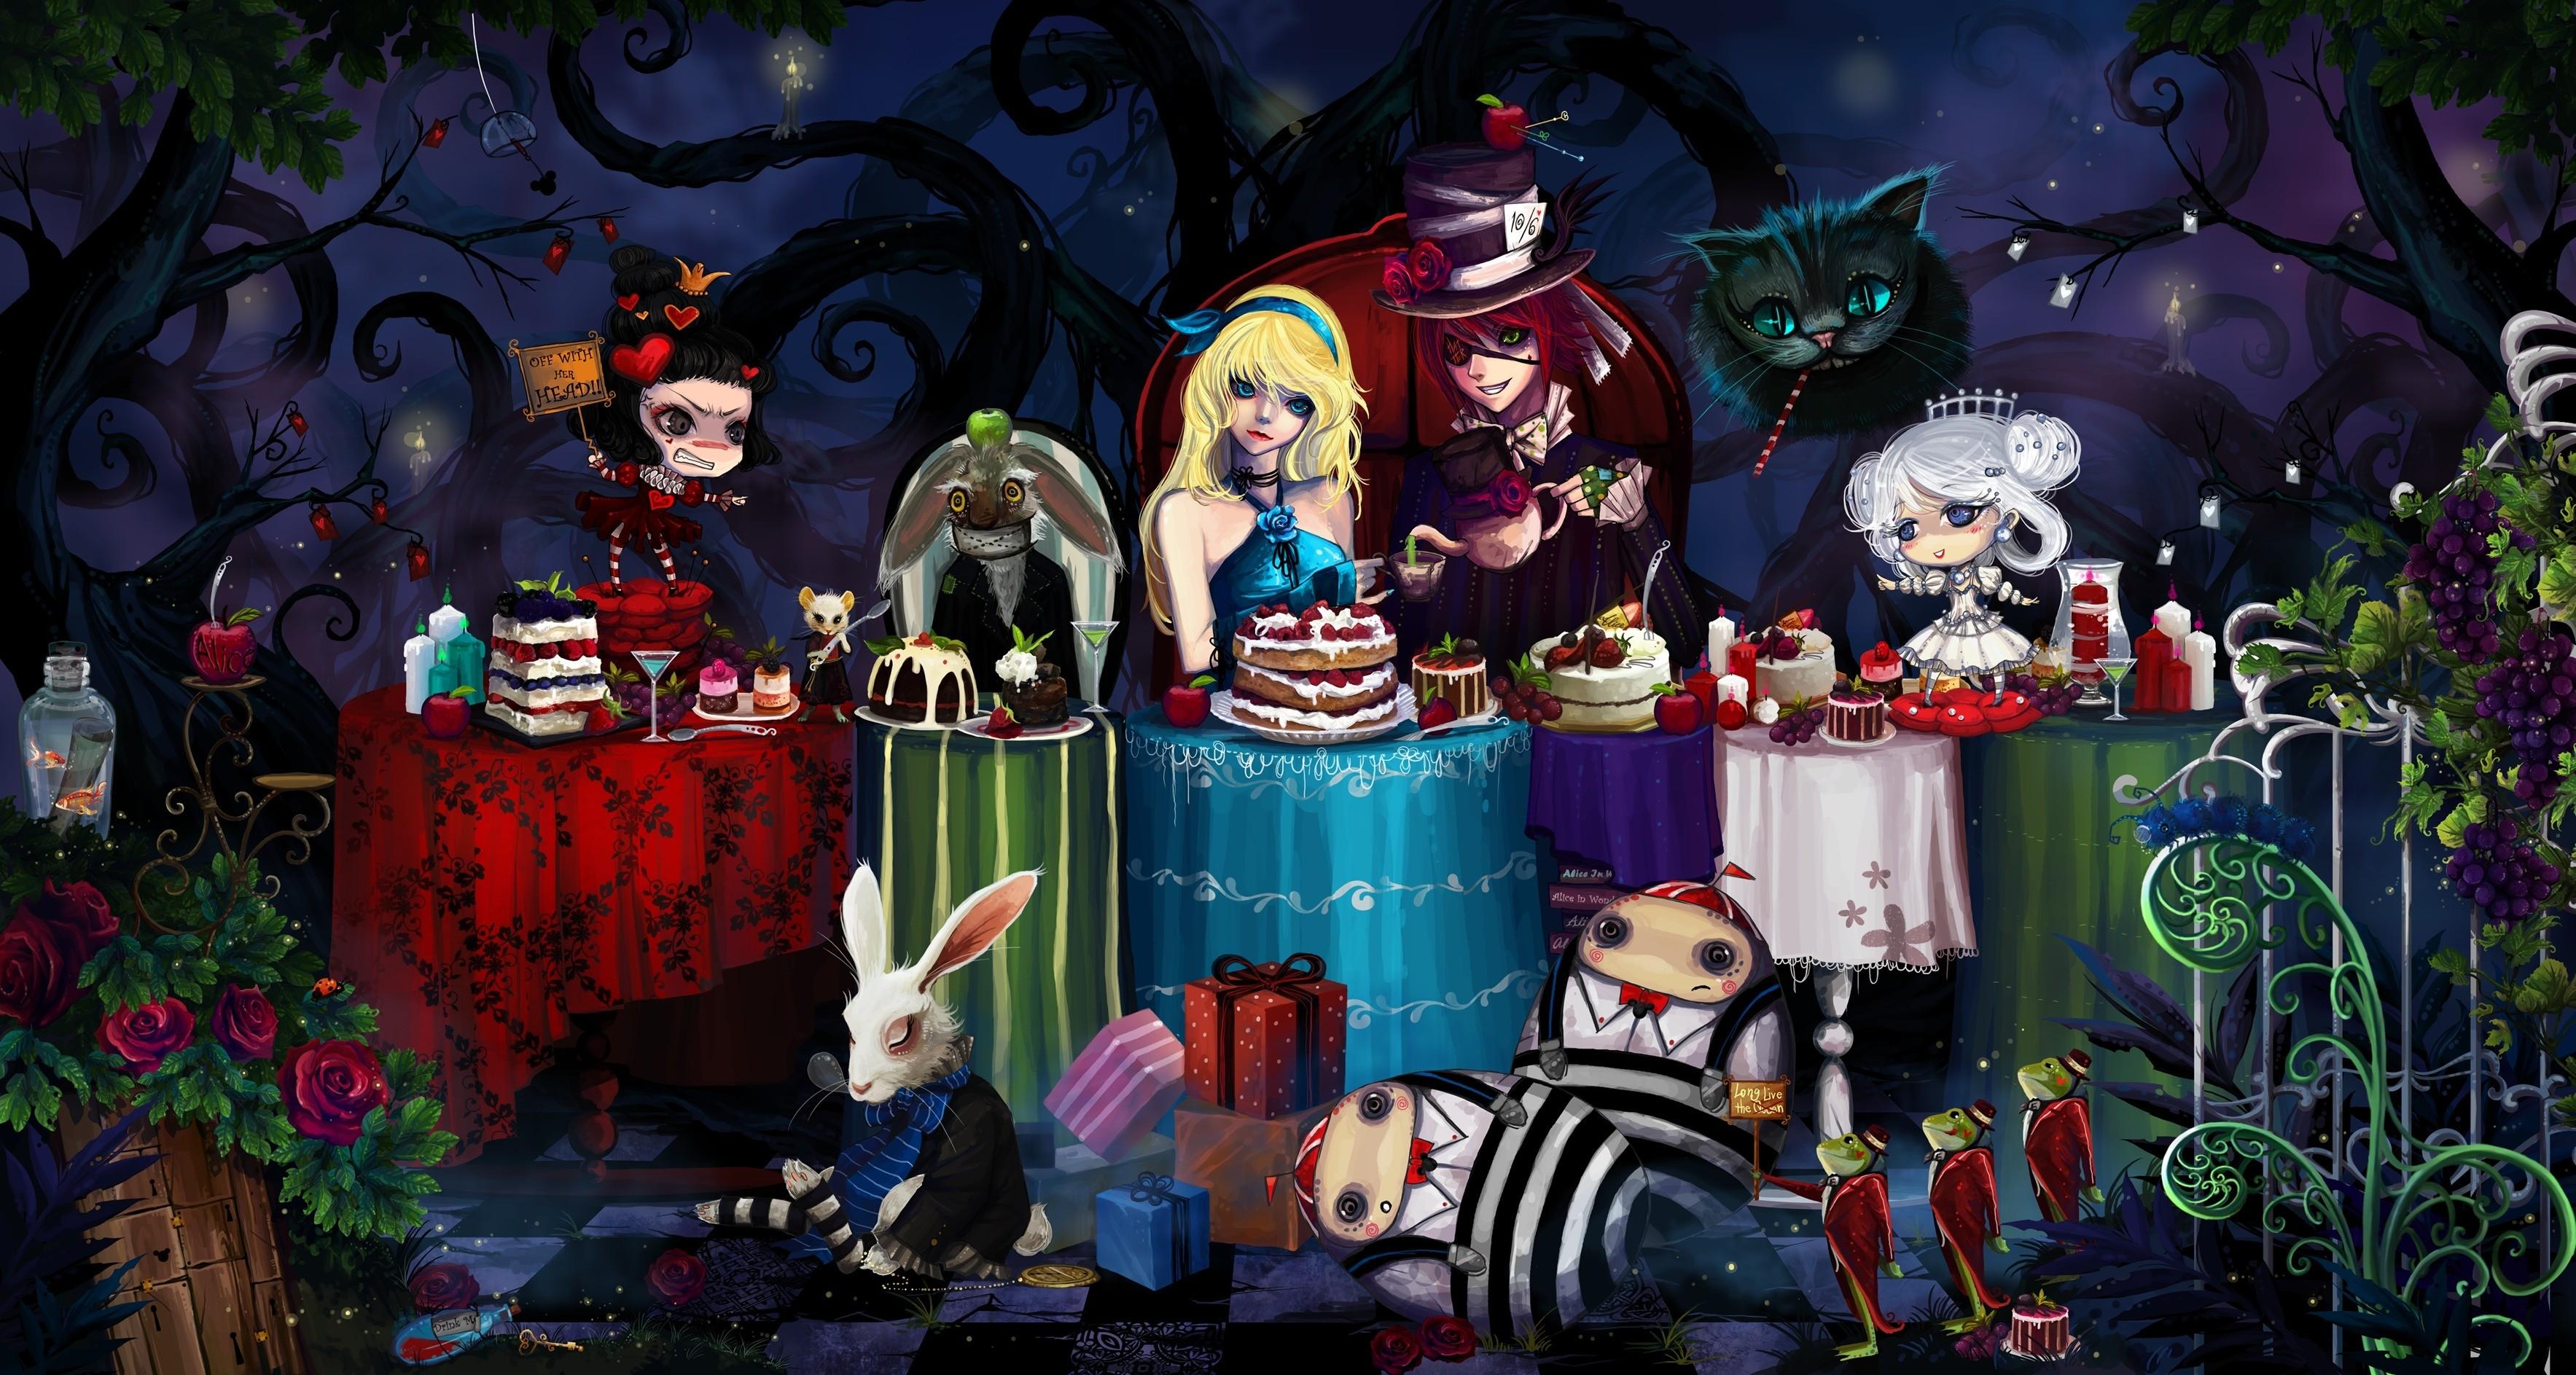 Alice In Wonderland Wallpaper.Alice In Wonderland Hd Wallpapers 69 Images